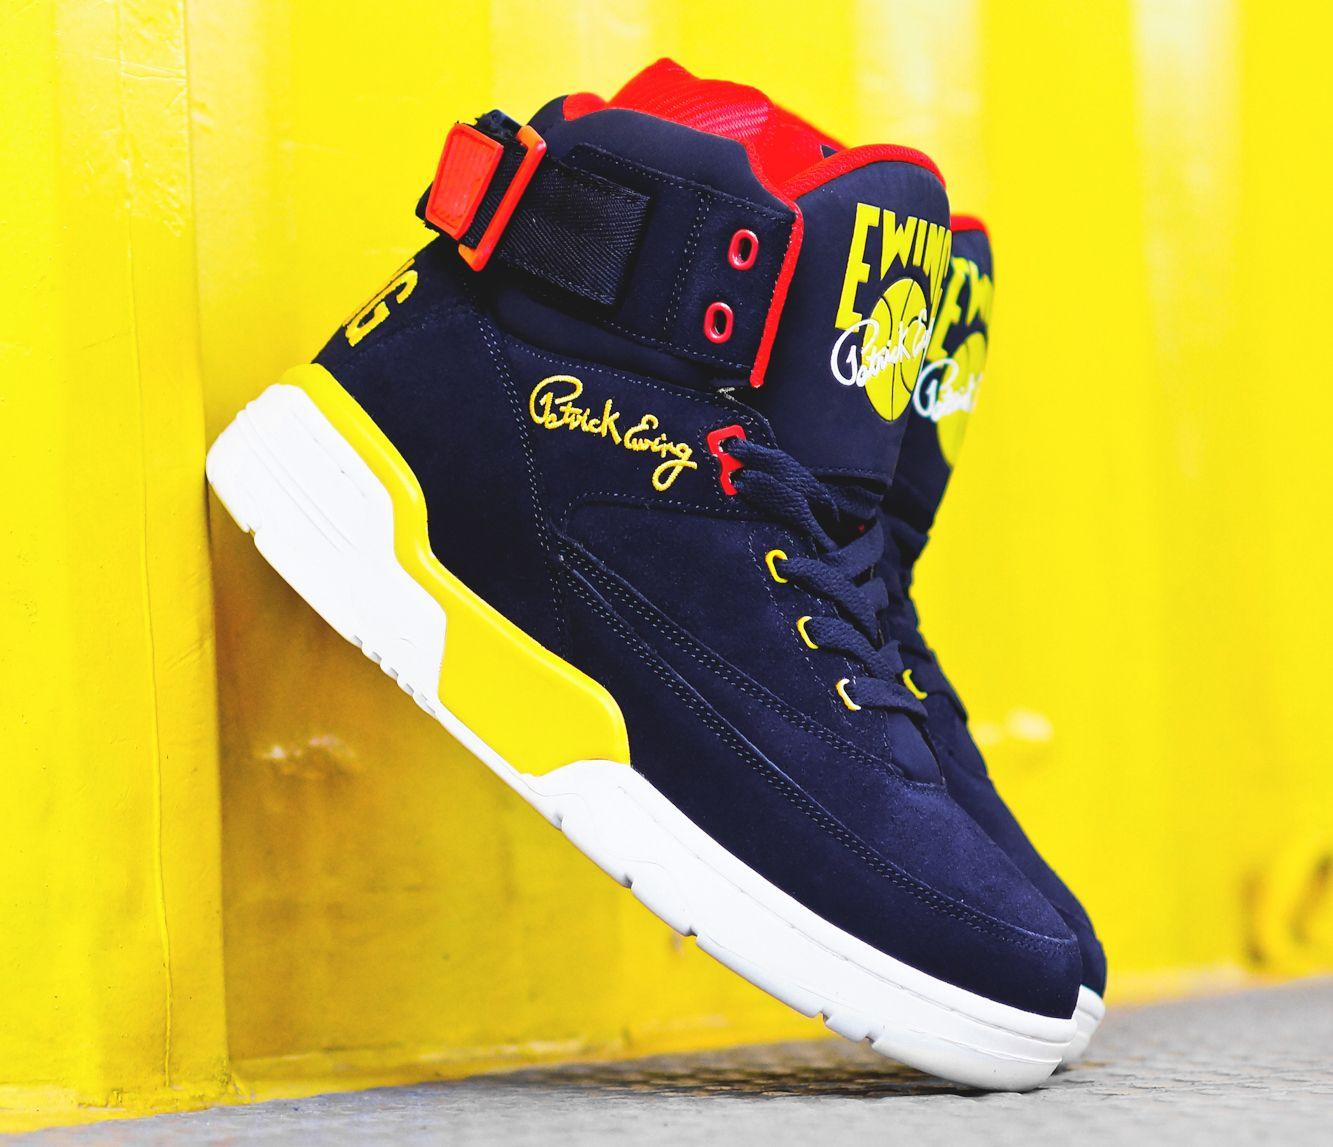 Ewing33 Hi Navy Yellow Red